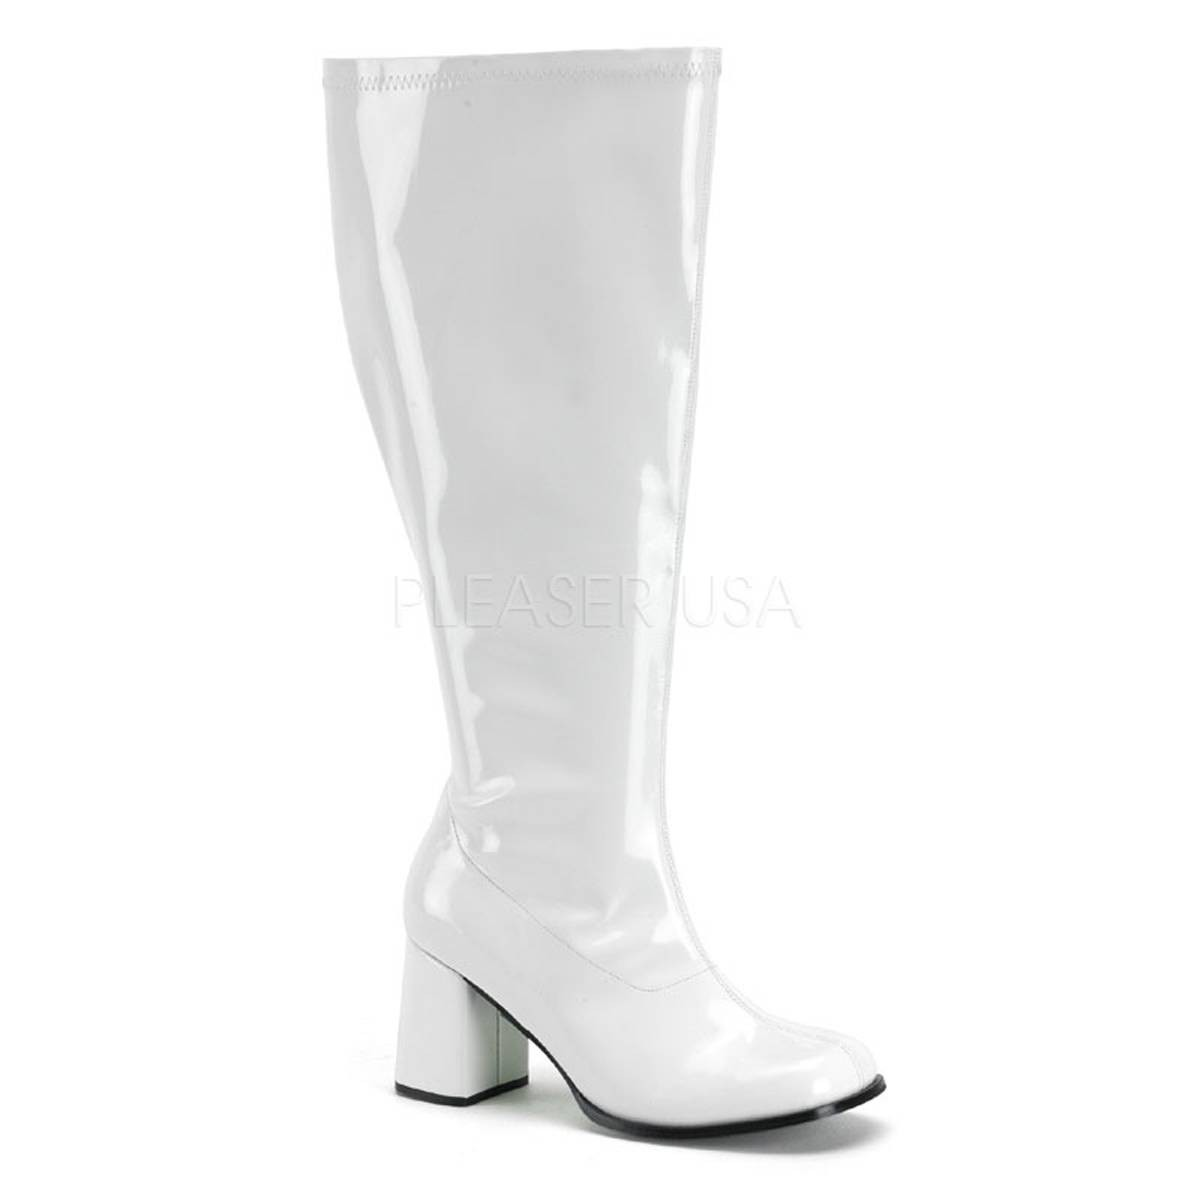 Stiefel - GOGO 300X ° Damen Stiefel ° Weiß Glänzend ° Funtasma  - Onlineshop RedSixty